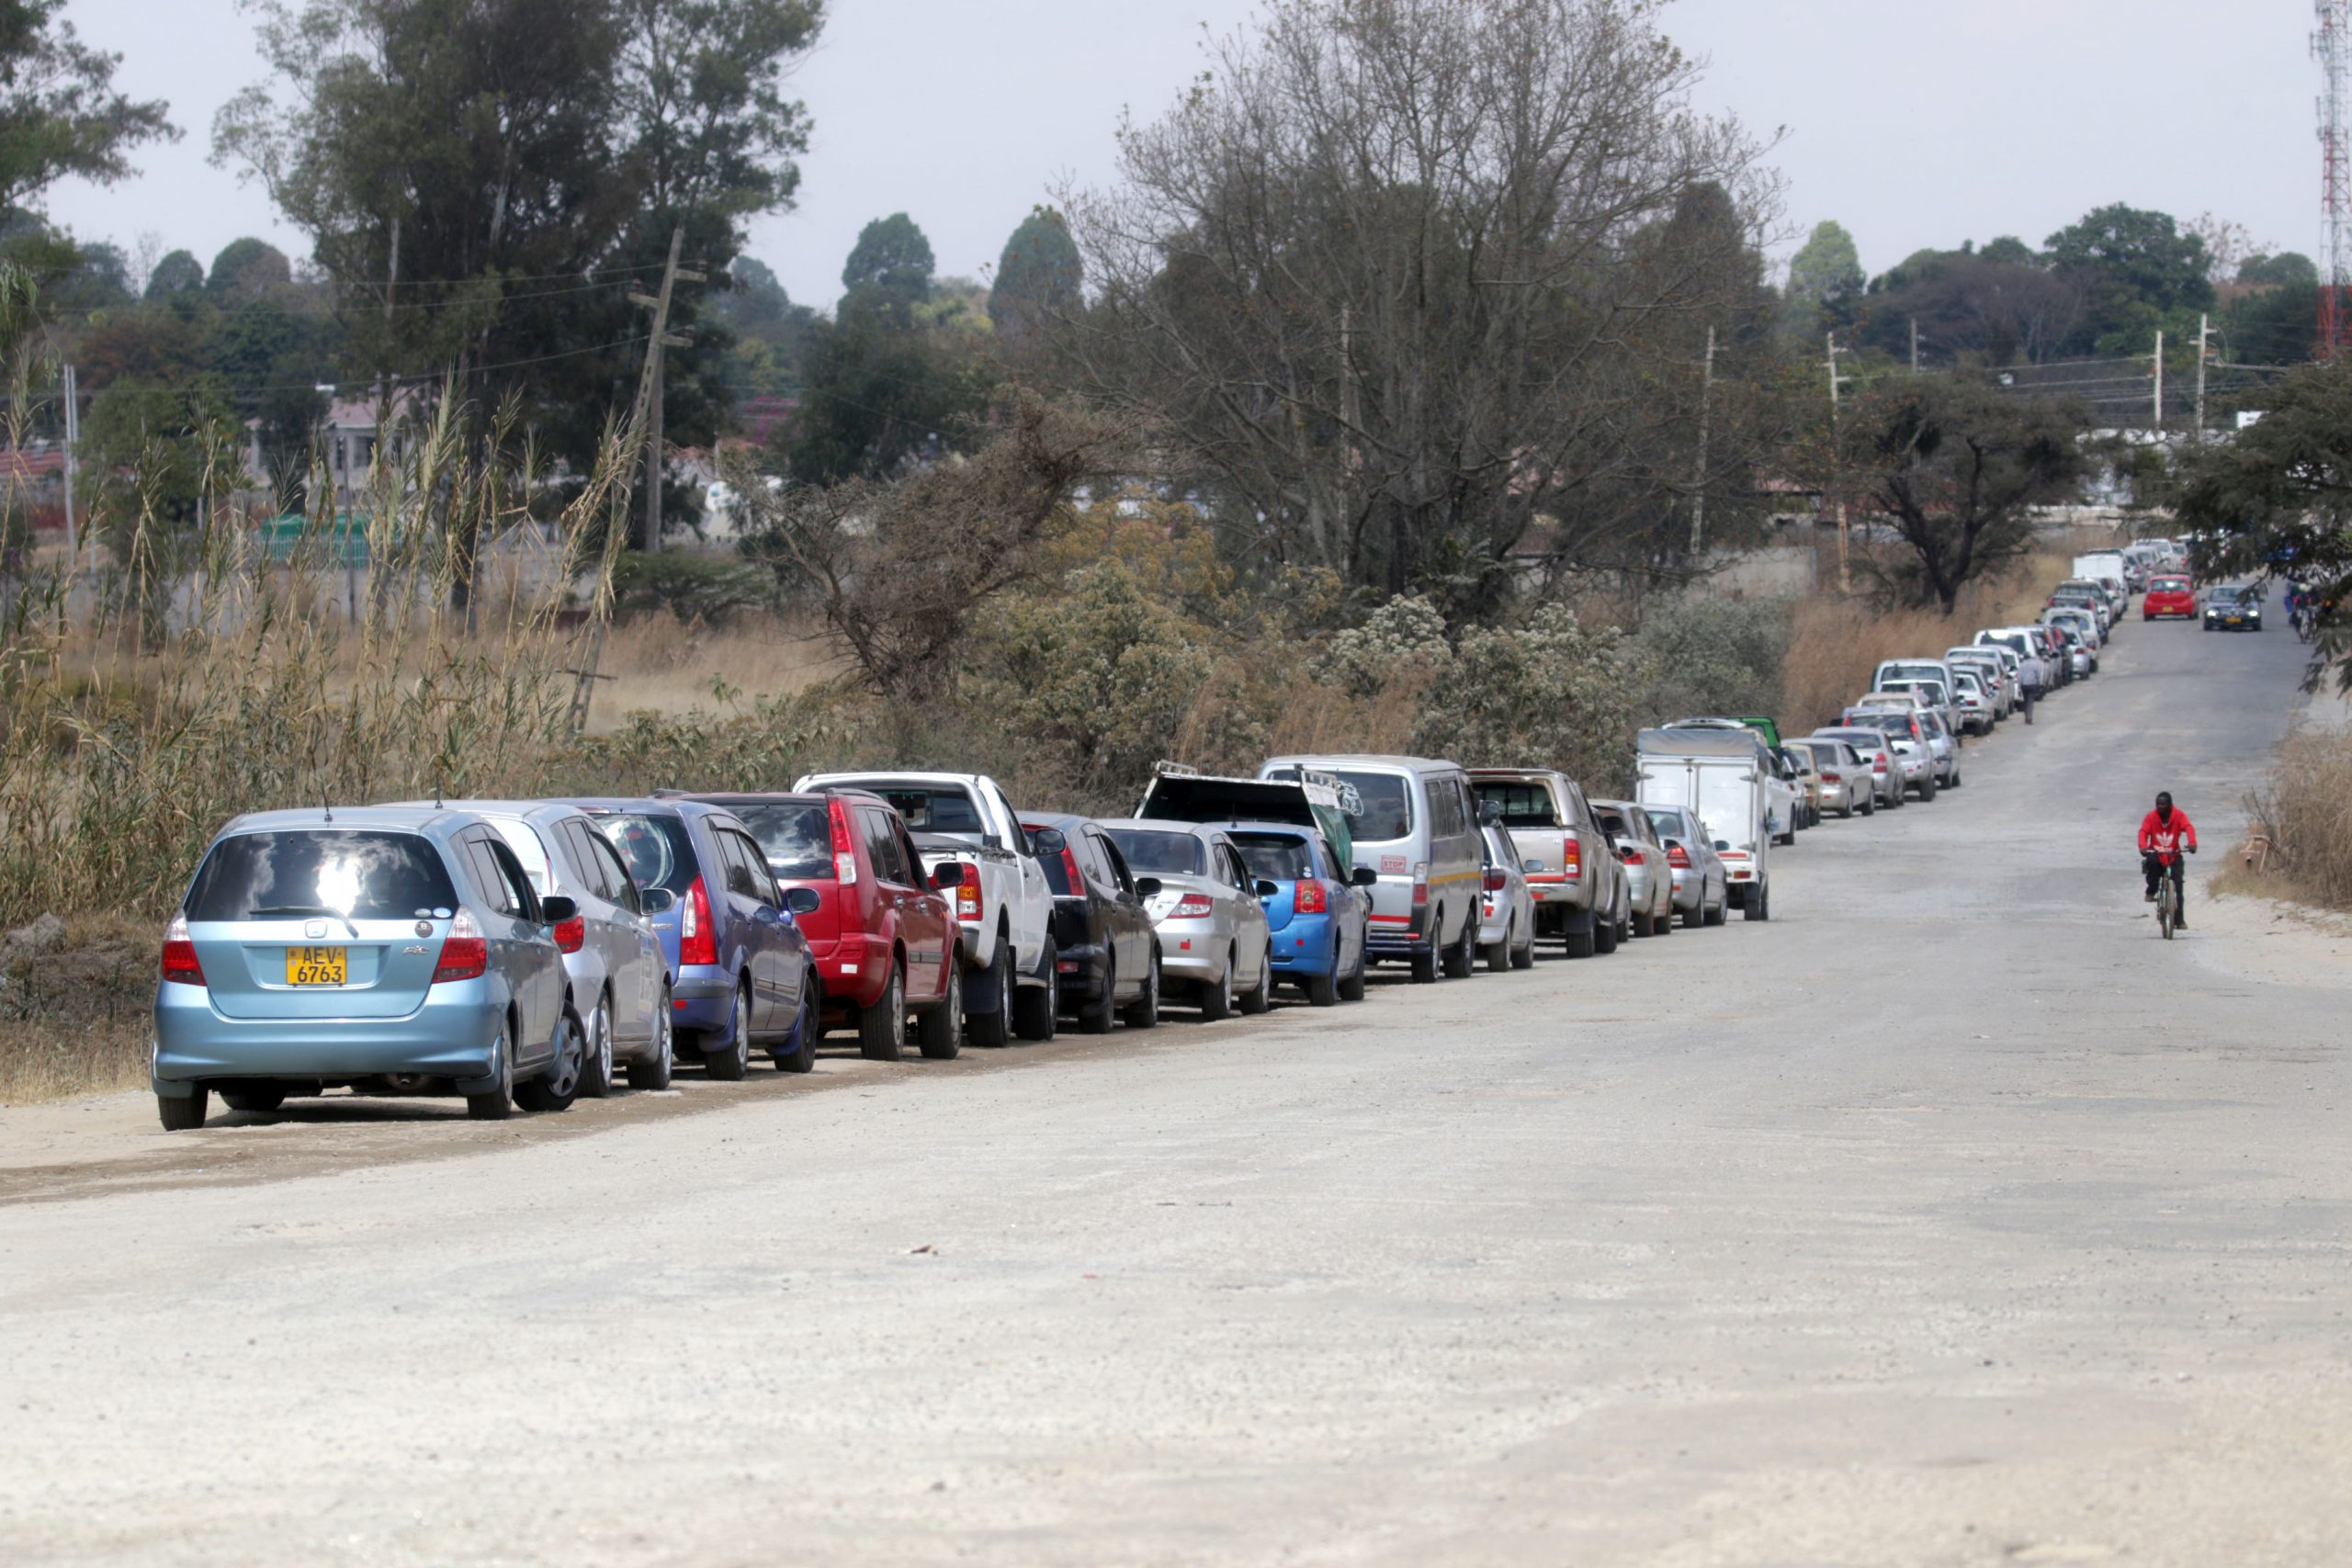 Long gas lines prompt Zimbabwe's propane entrepreneurs